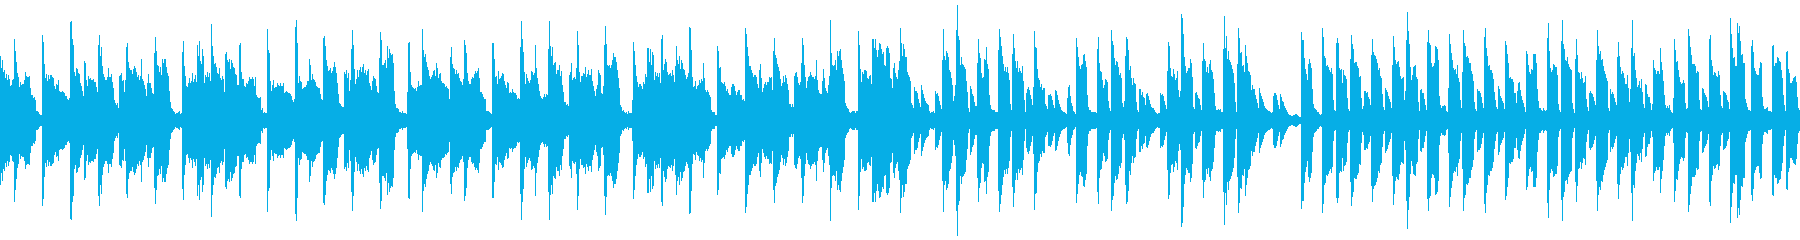 【Dr抜】可愛さとアングラのHIPHOPの再生済みの波形